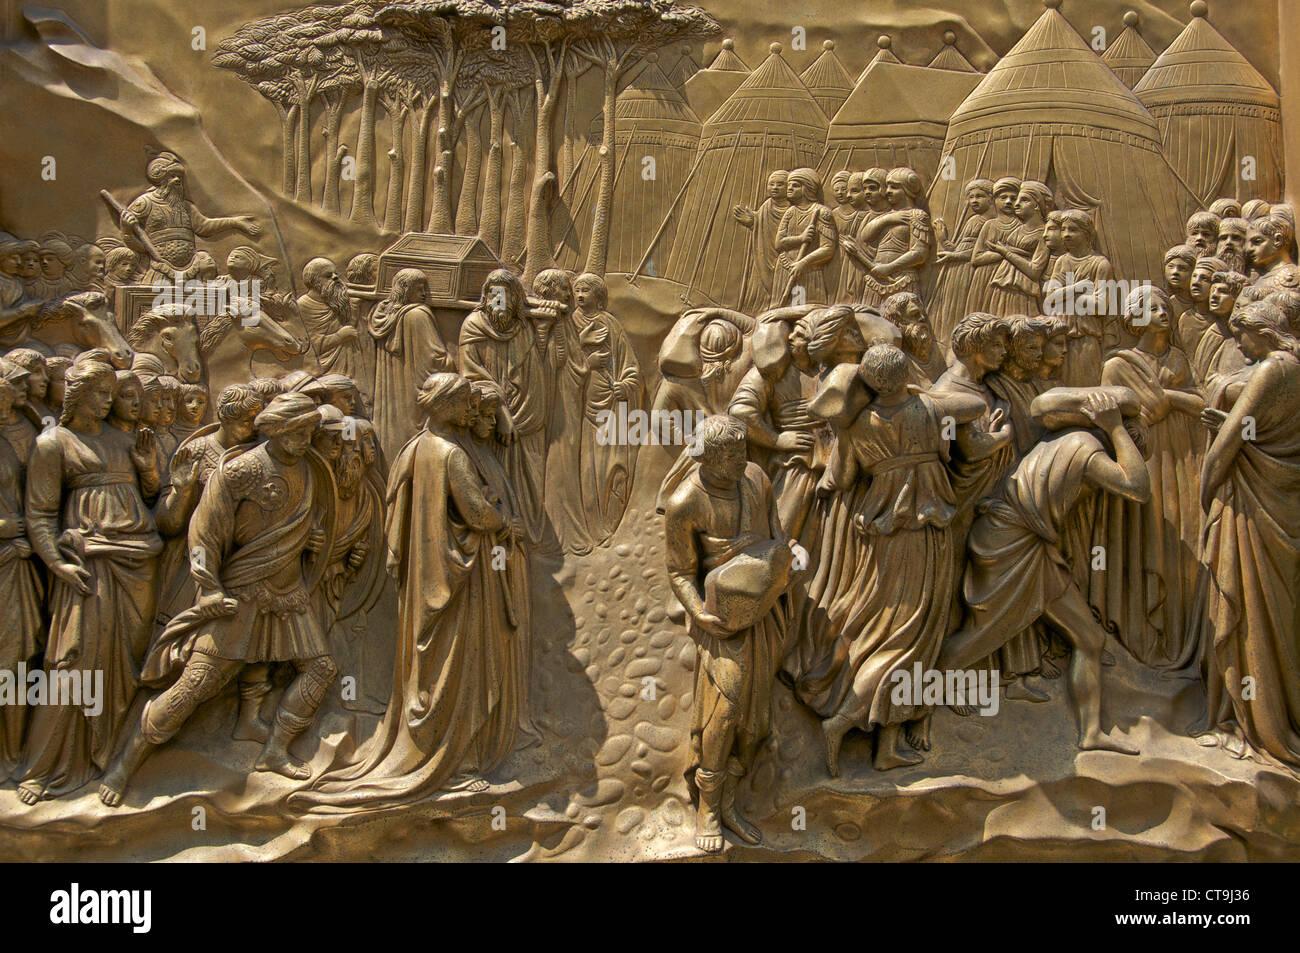 Joshua Lorenzo Ghiberti\u0027s Gates of Paradise doors Baptistry Florence Italy & Joshua Lorenzo Ghiberti\u0027s Gates of Paradise doors Baptistry ... Pezcame.Com